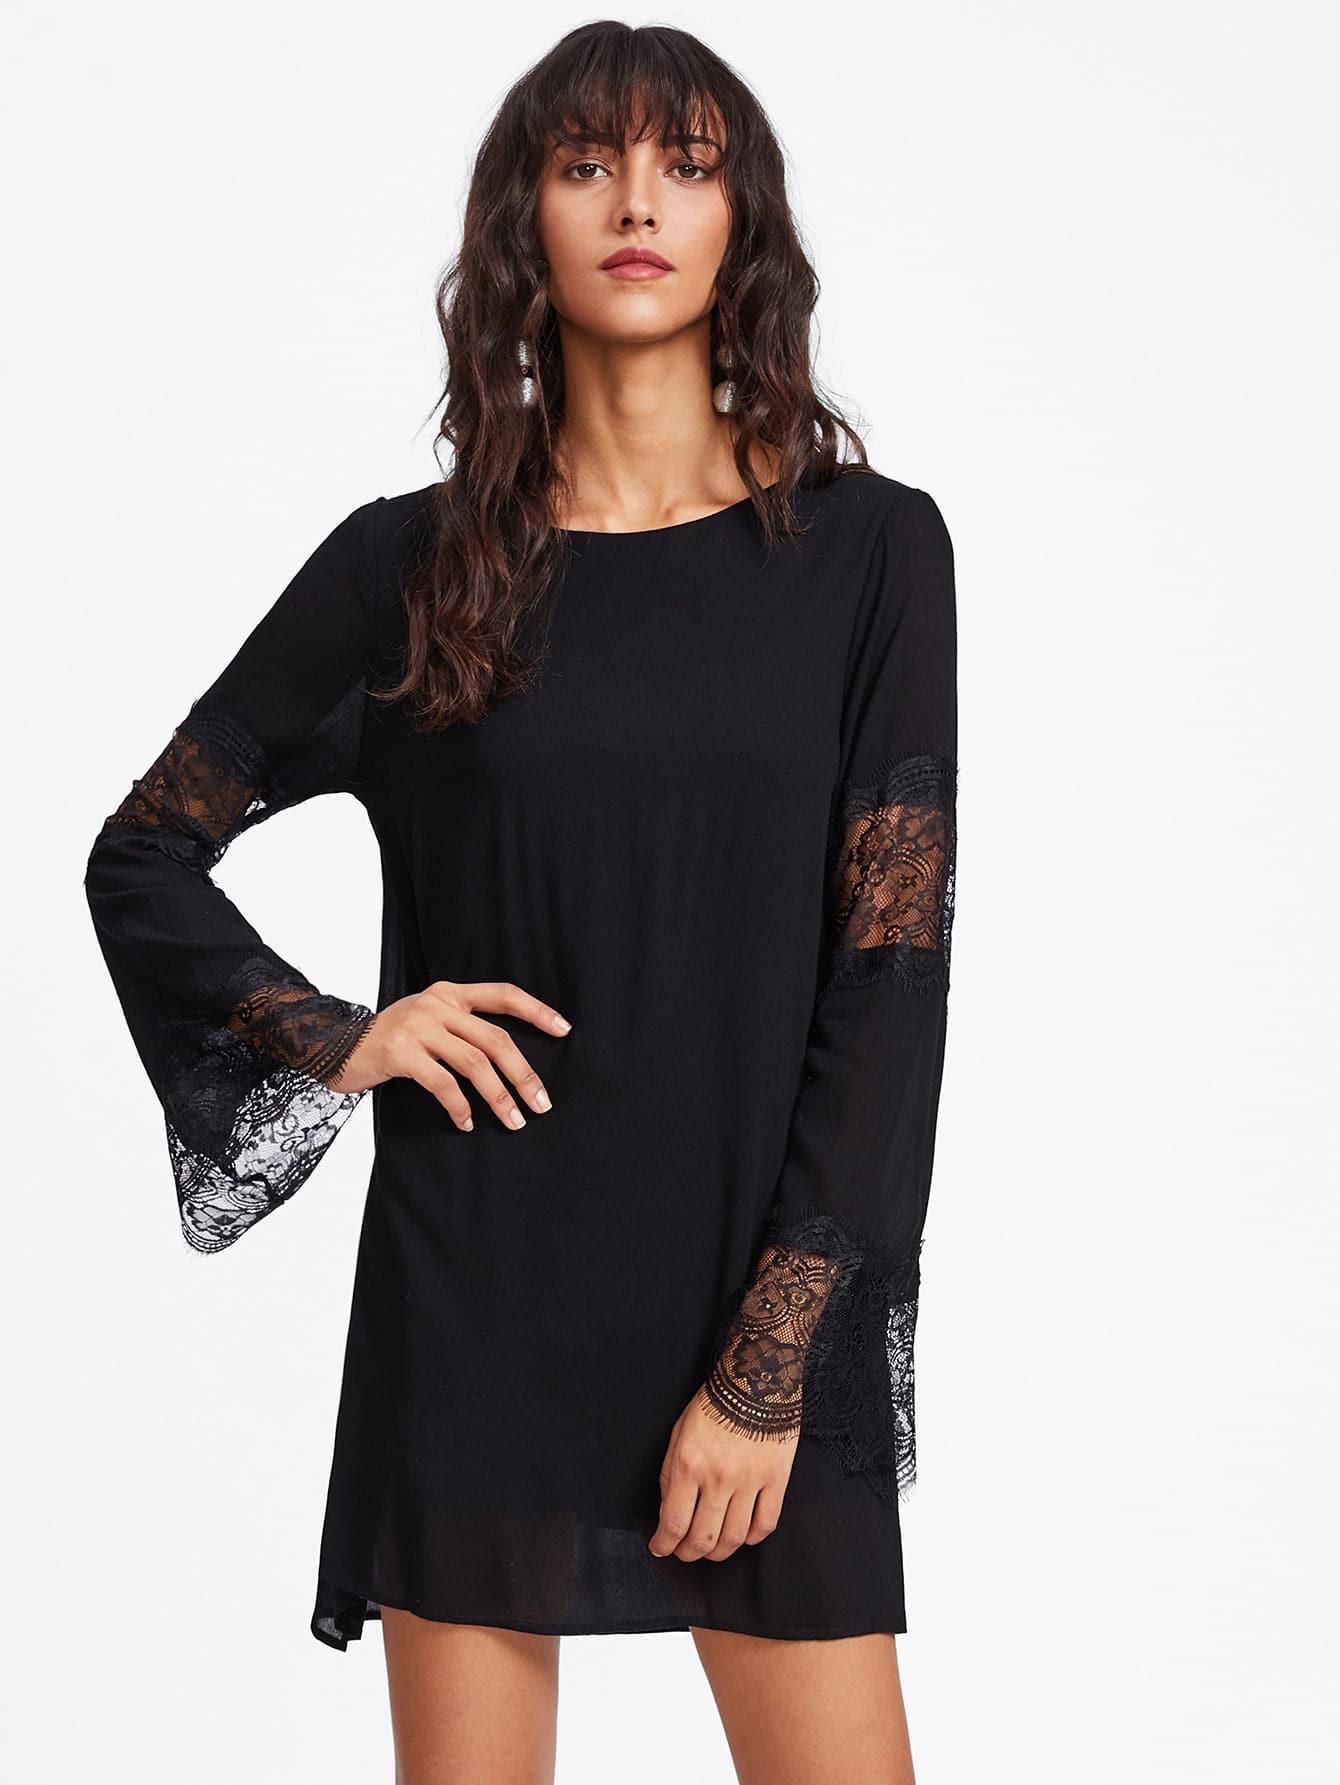 Contrast Scallop Eyelash Lace Double Layer Dress dress170918010